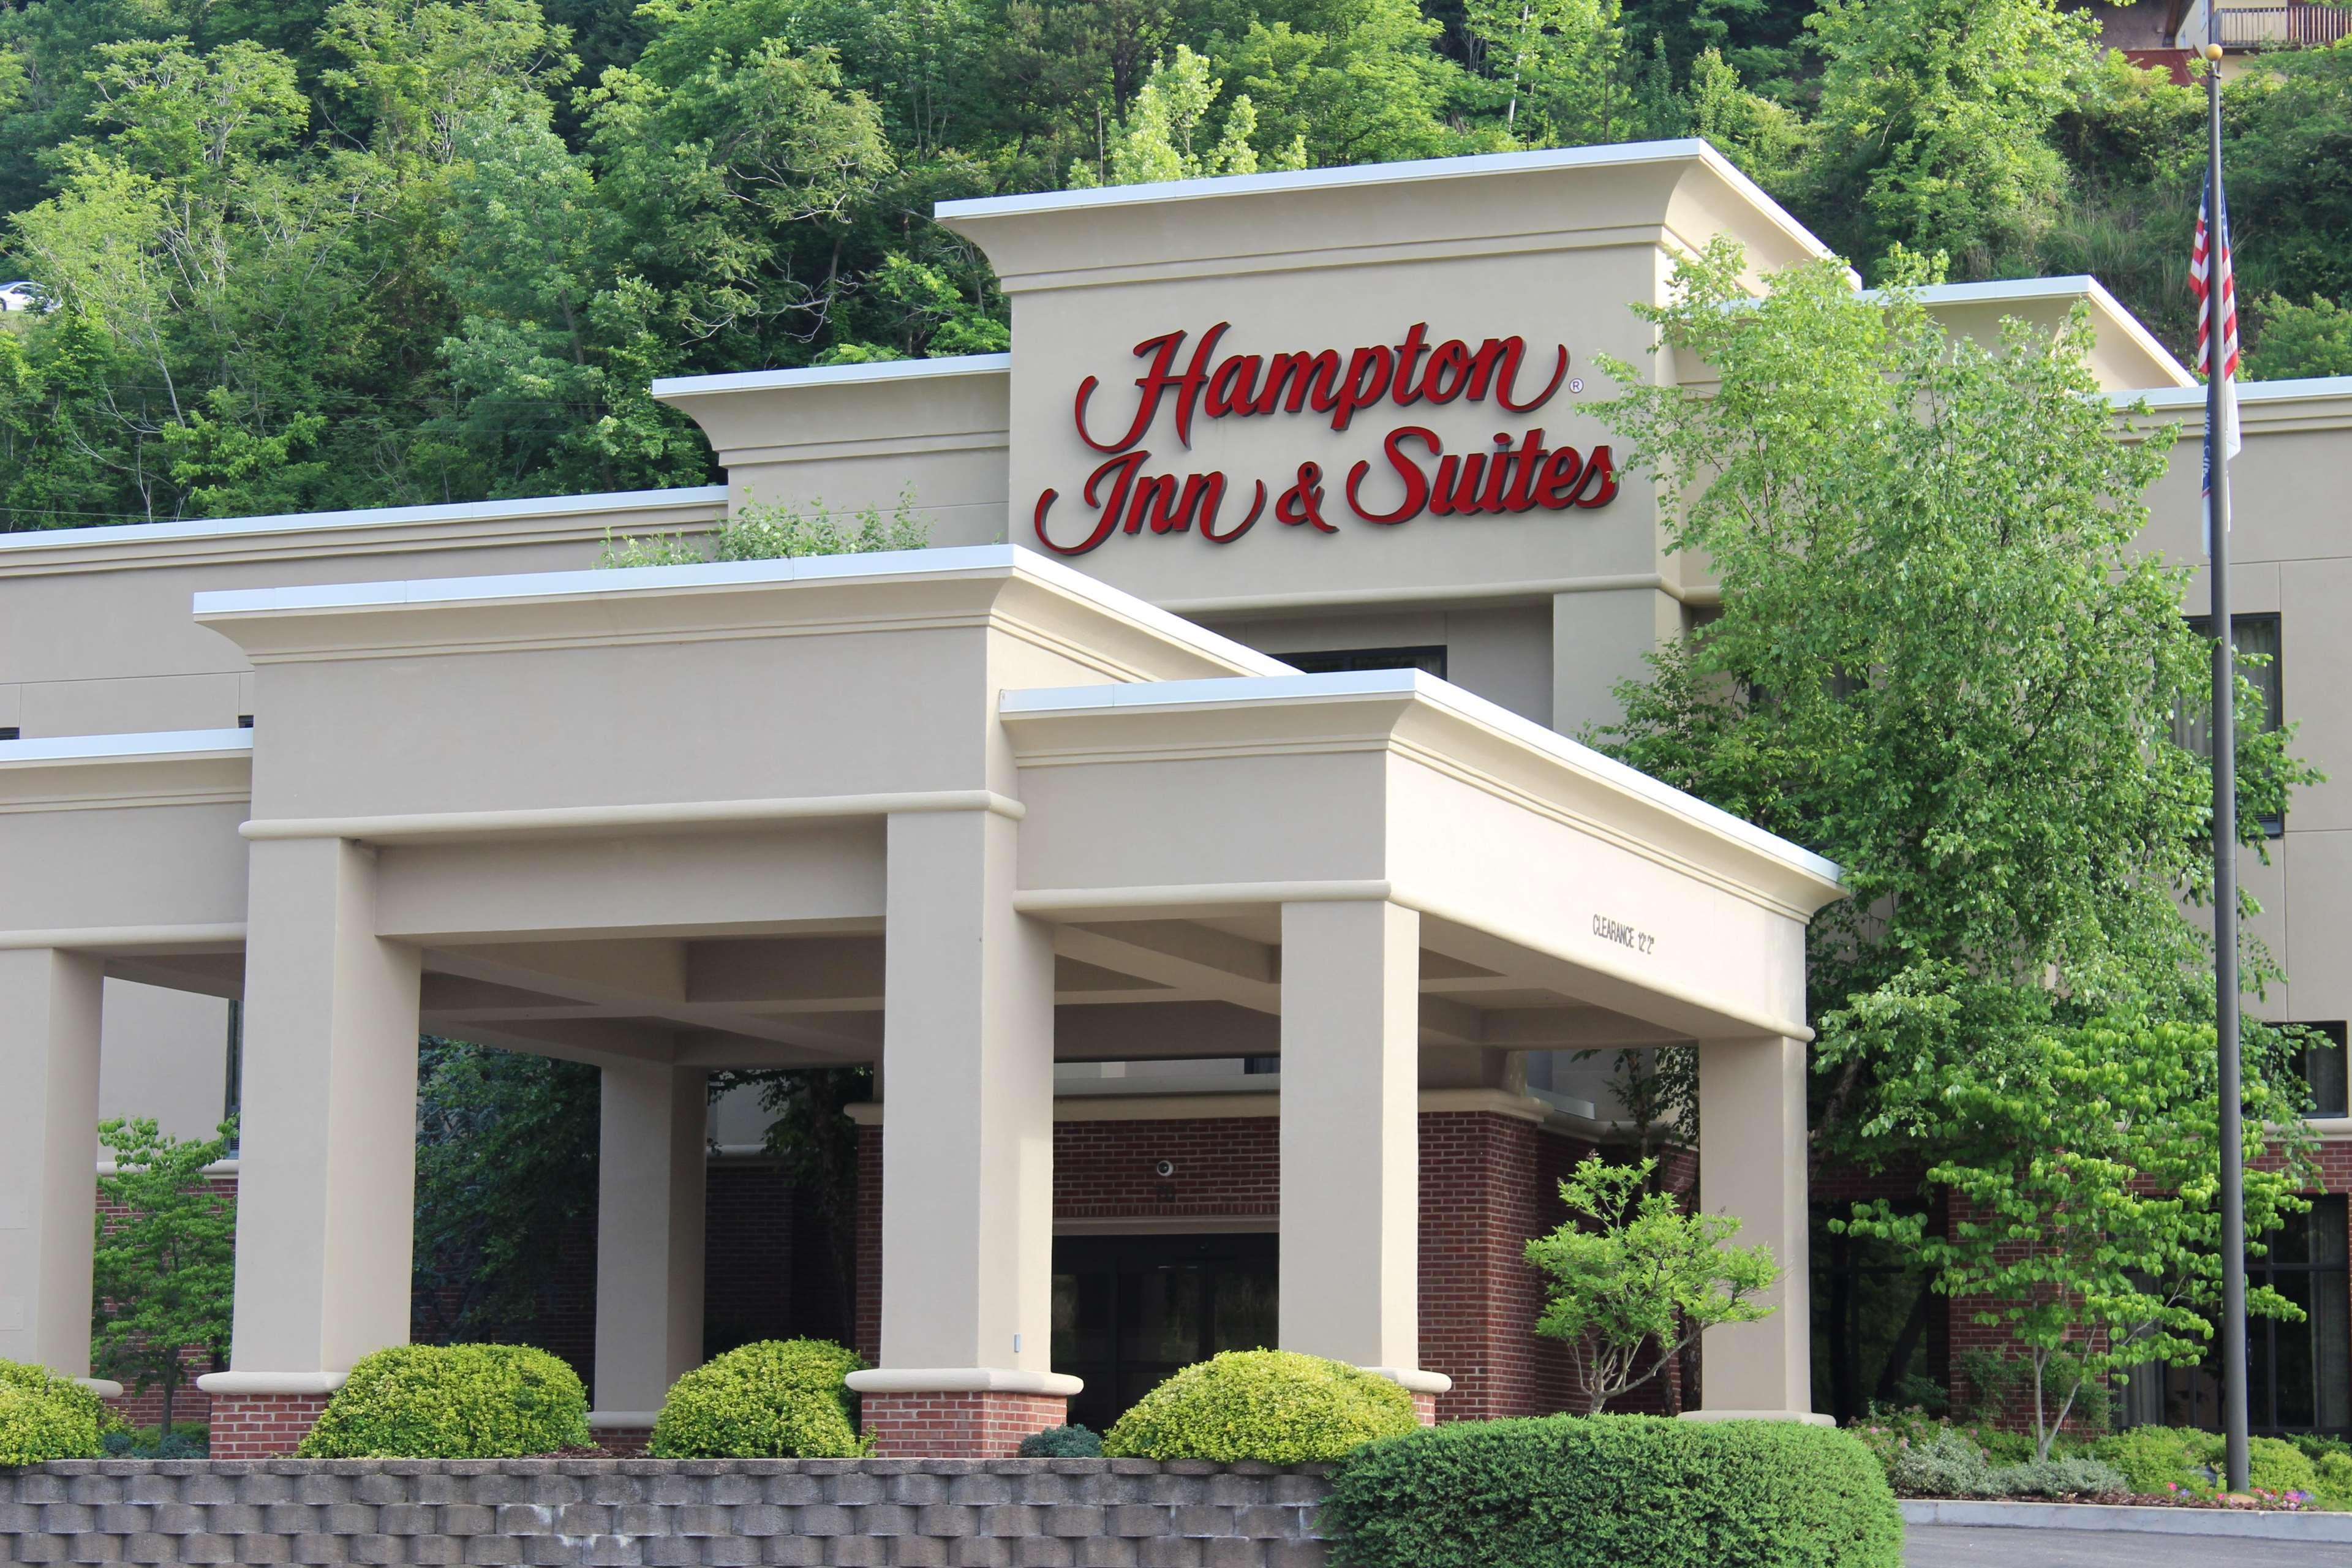 Hampton Inn & Suites Hazard image 0